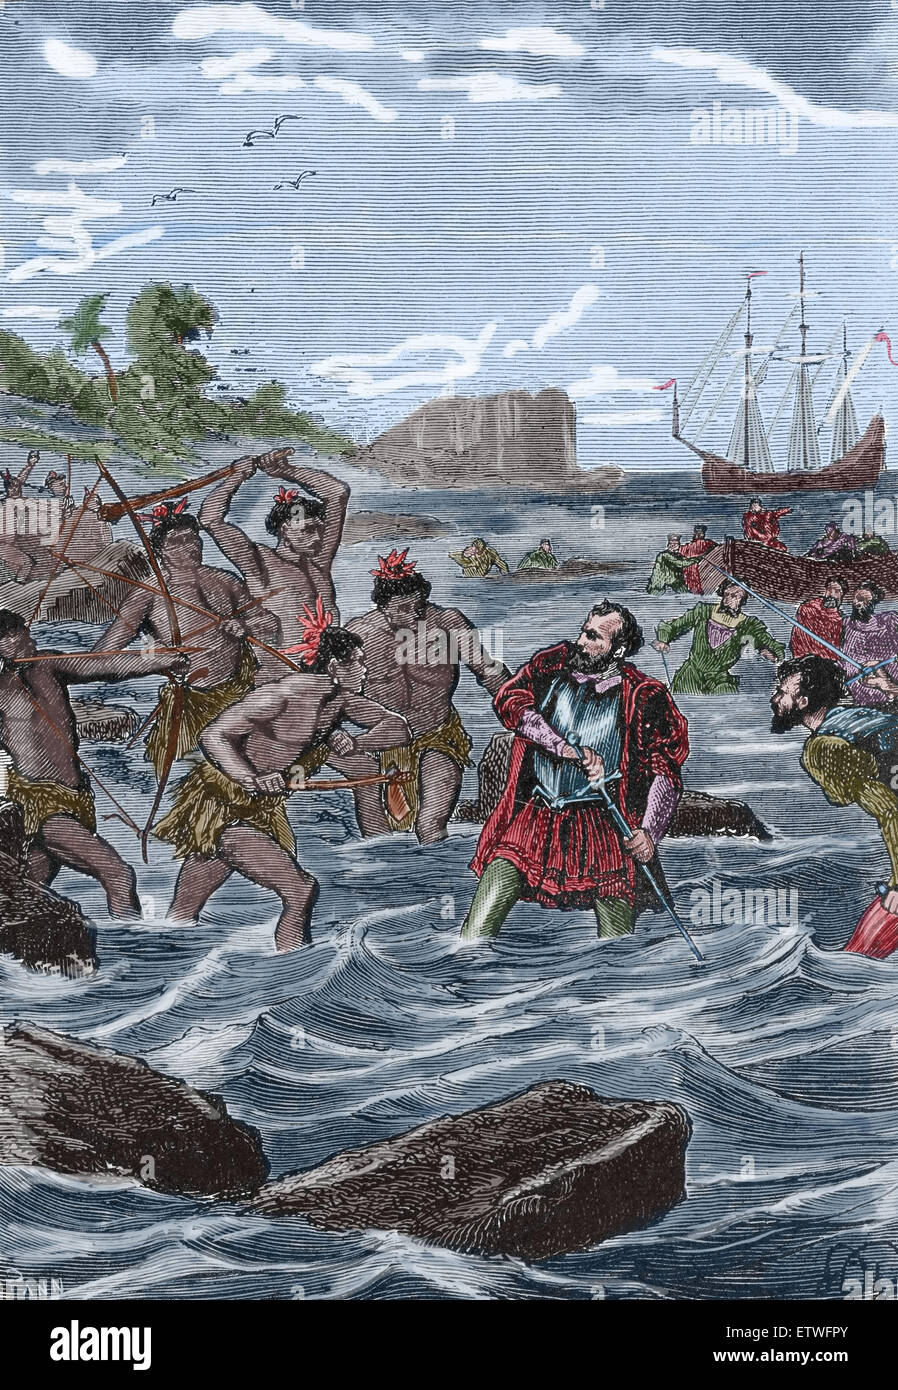 Ferdinand Magellan (1480-1521). Portuguese explorer. Death Magellan at the Philippines Island. 1521. Color engraving. - Stock Image